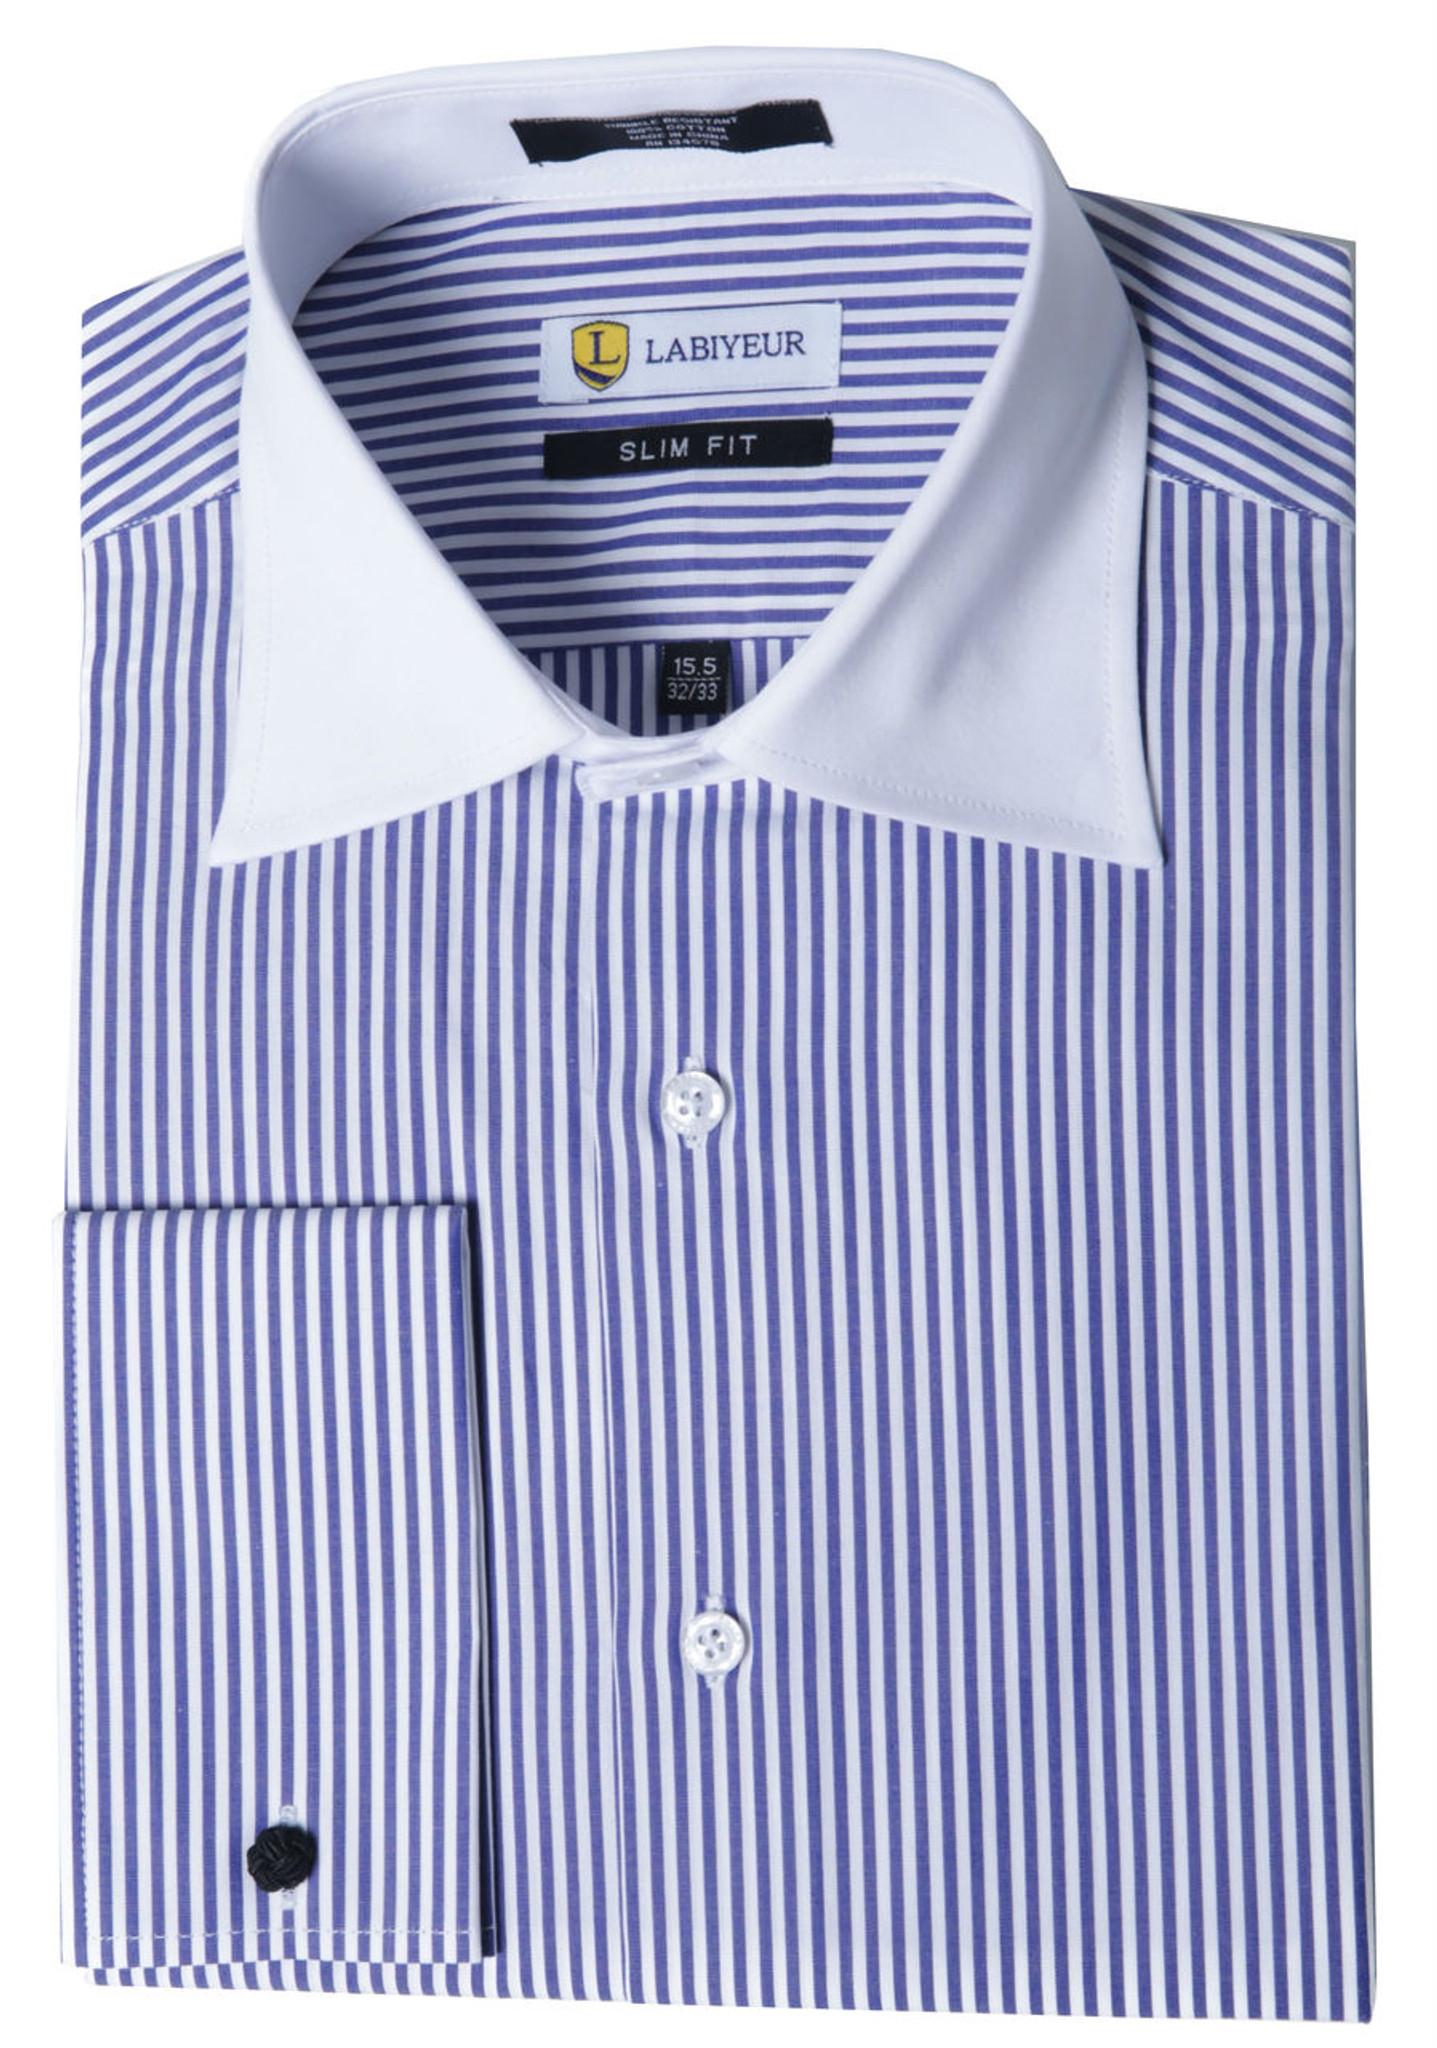 Labiyeur Men S Slim Fit French Cuff Striped Dress Shirt